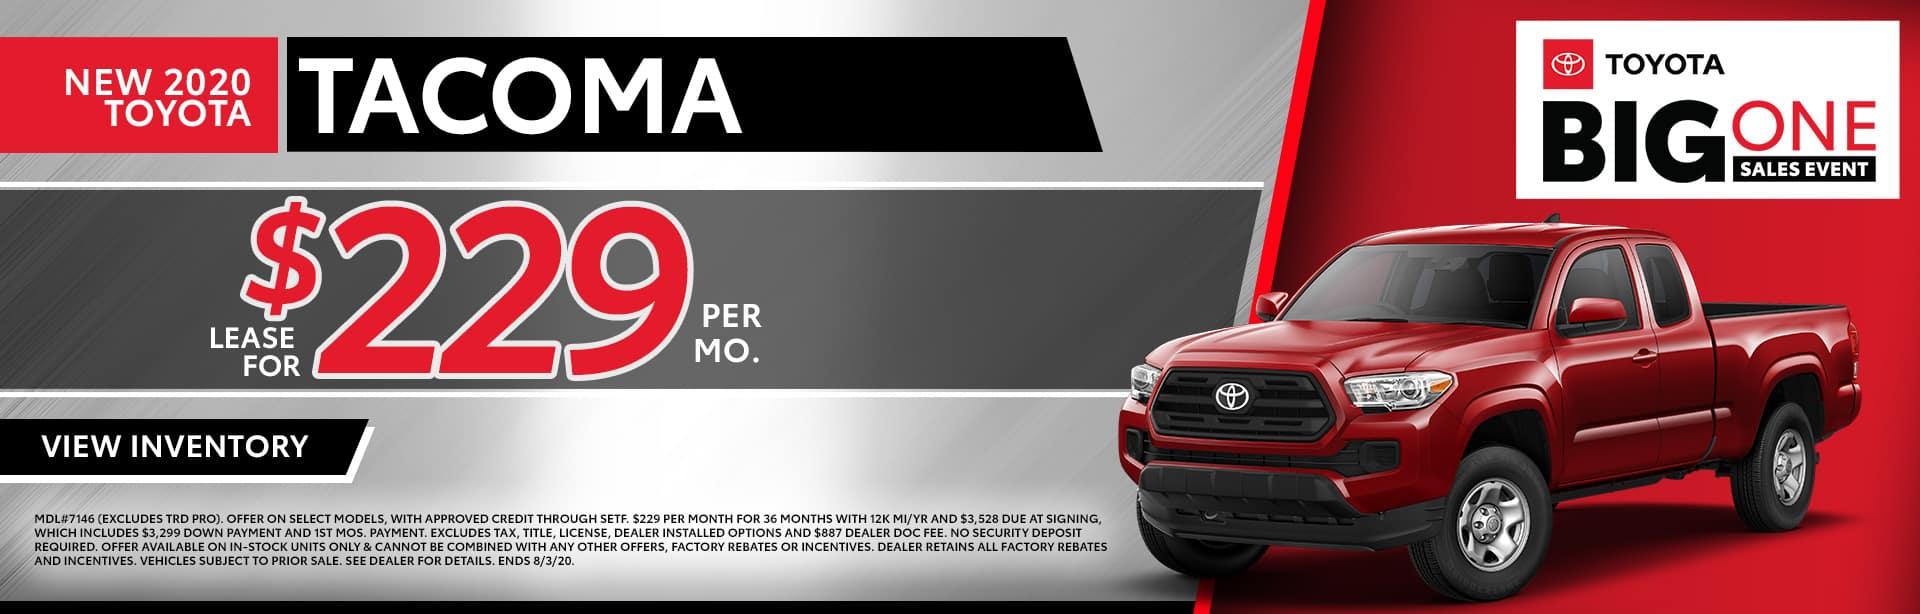 New 2020 Toyota Tacoma at Toyota of Fort Walton Beach!